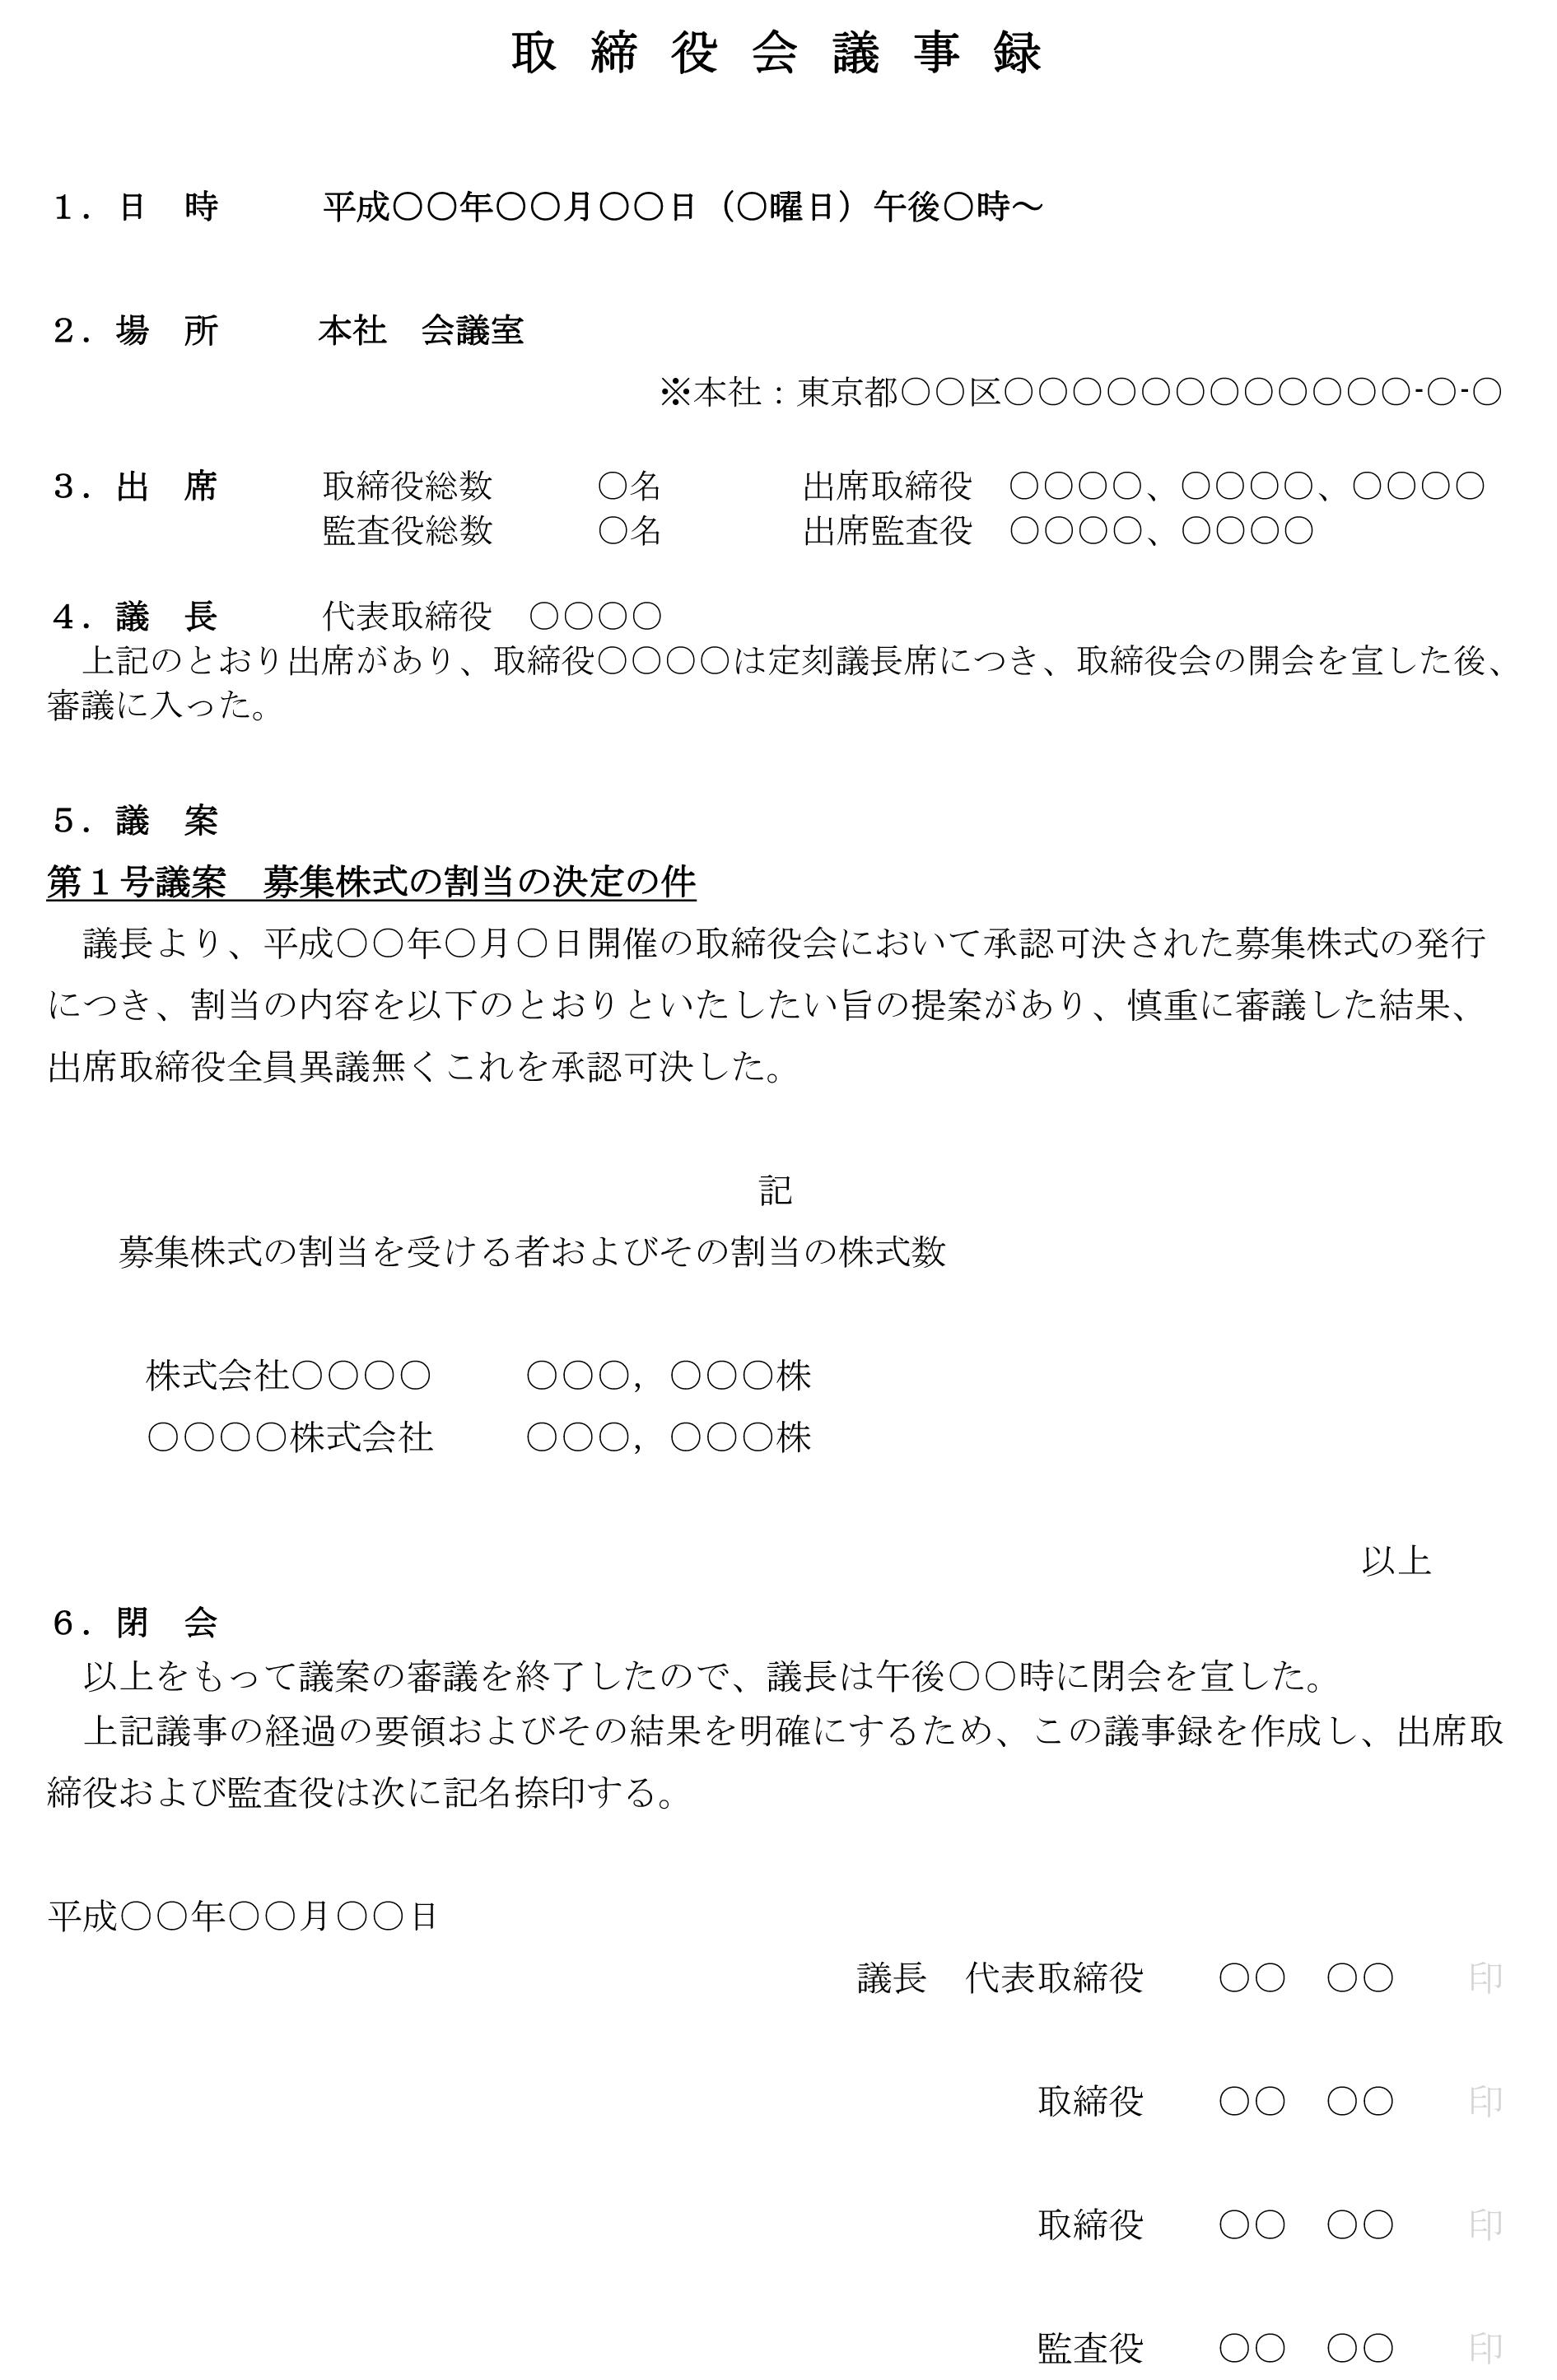 取締役会議事録(募集株式発行(割当の決定))